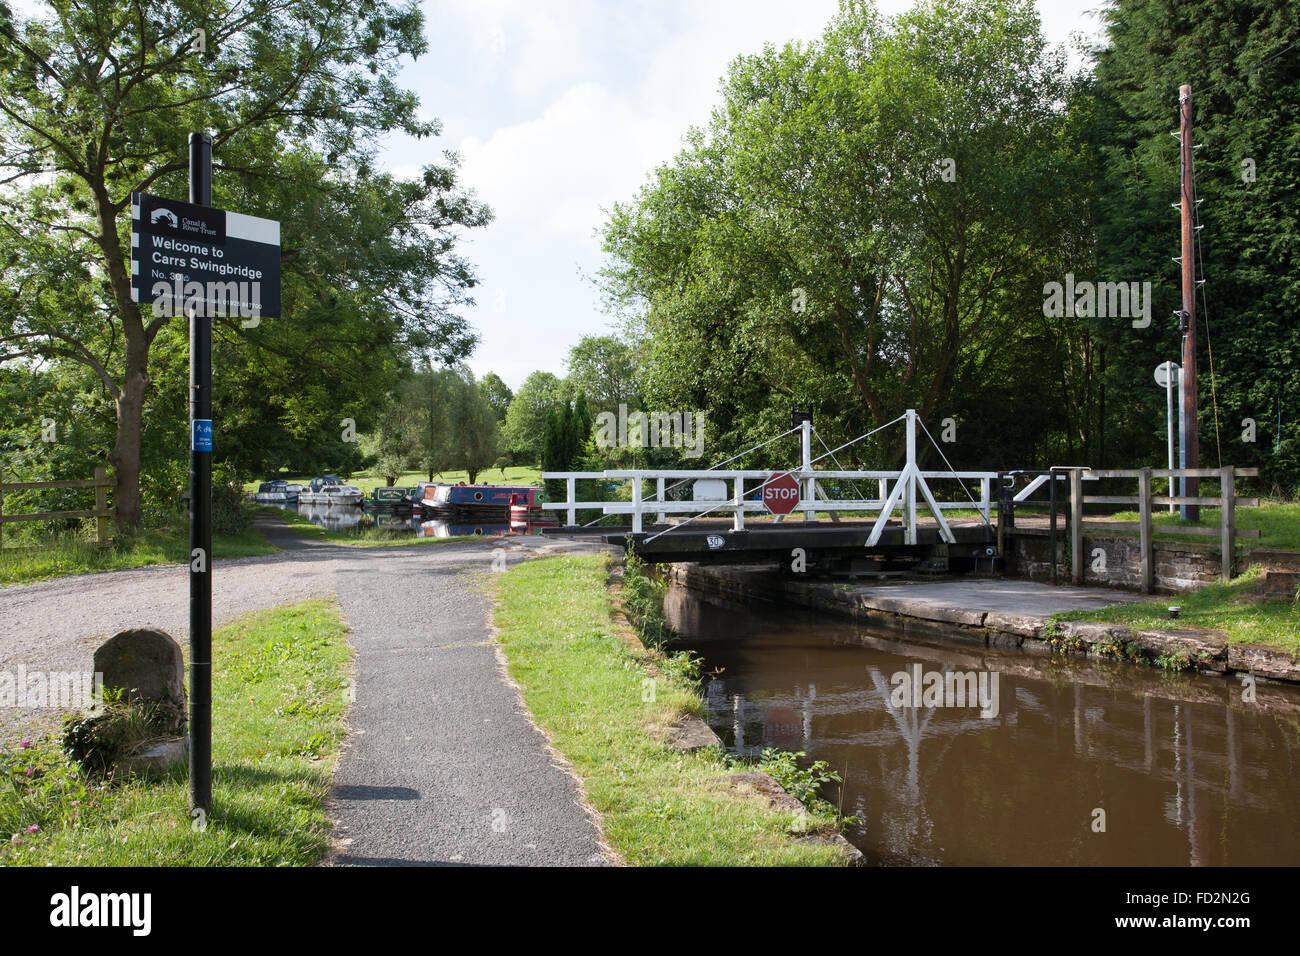 Carrs swingbridge on the Peak district canal - Stock Image